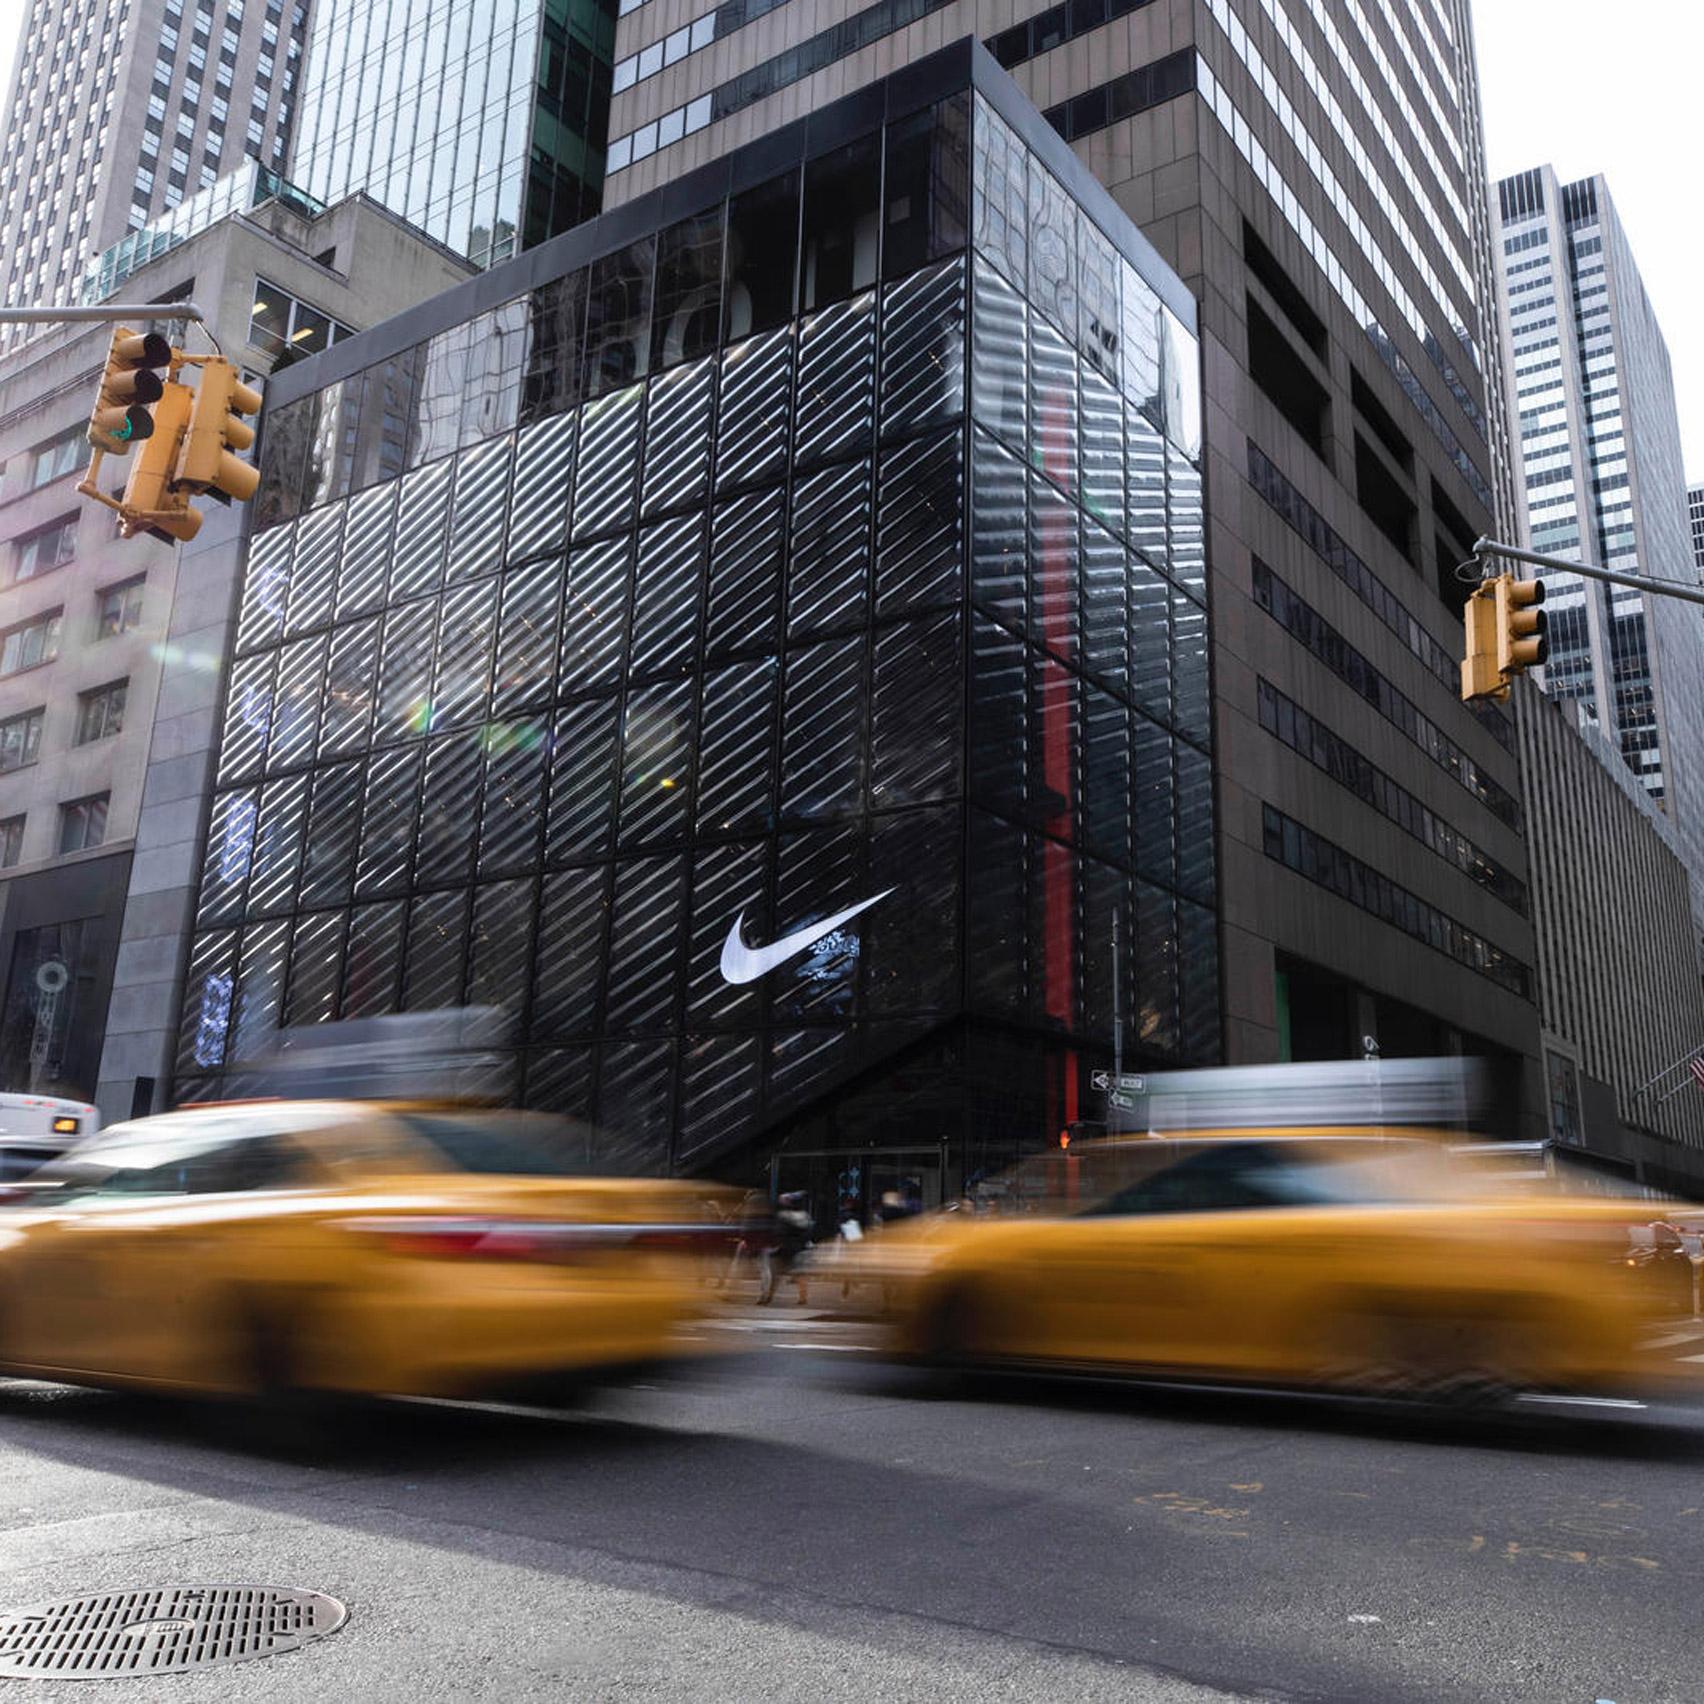 Interminable conservador Velas  Nike flagship aims to disrupt New York's